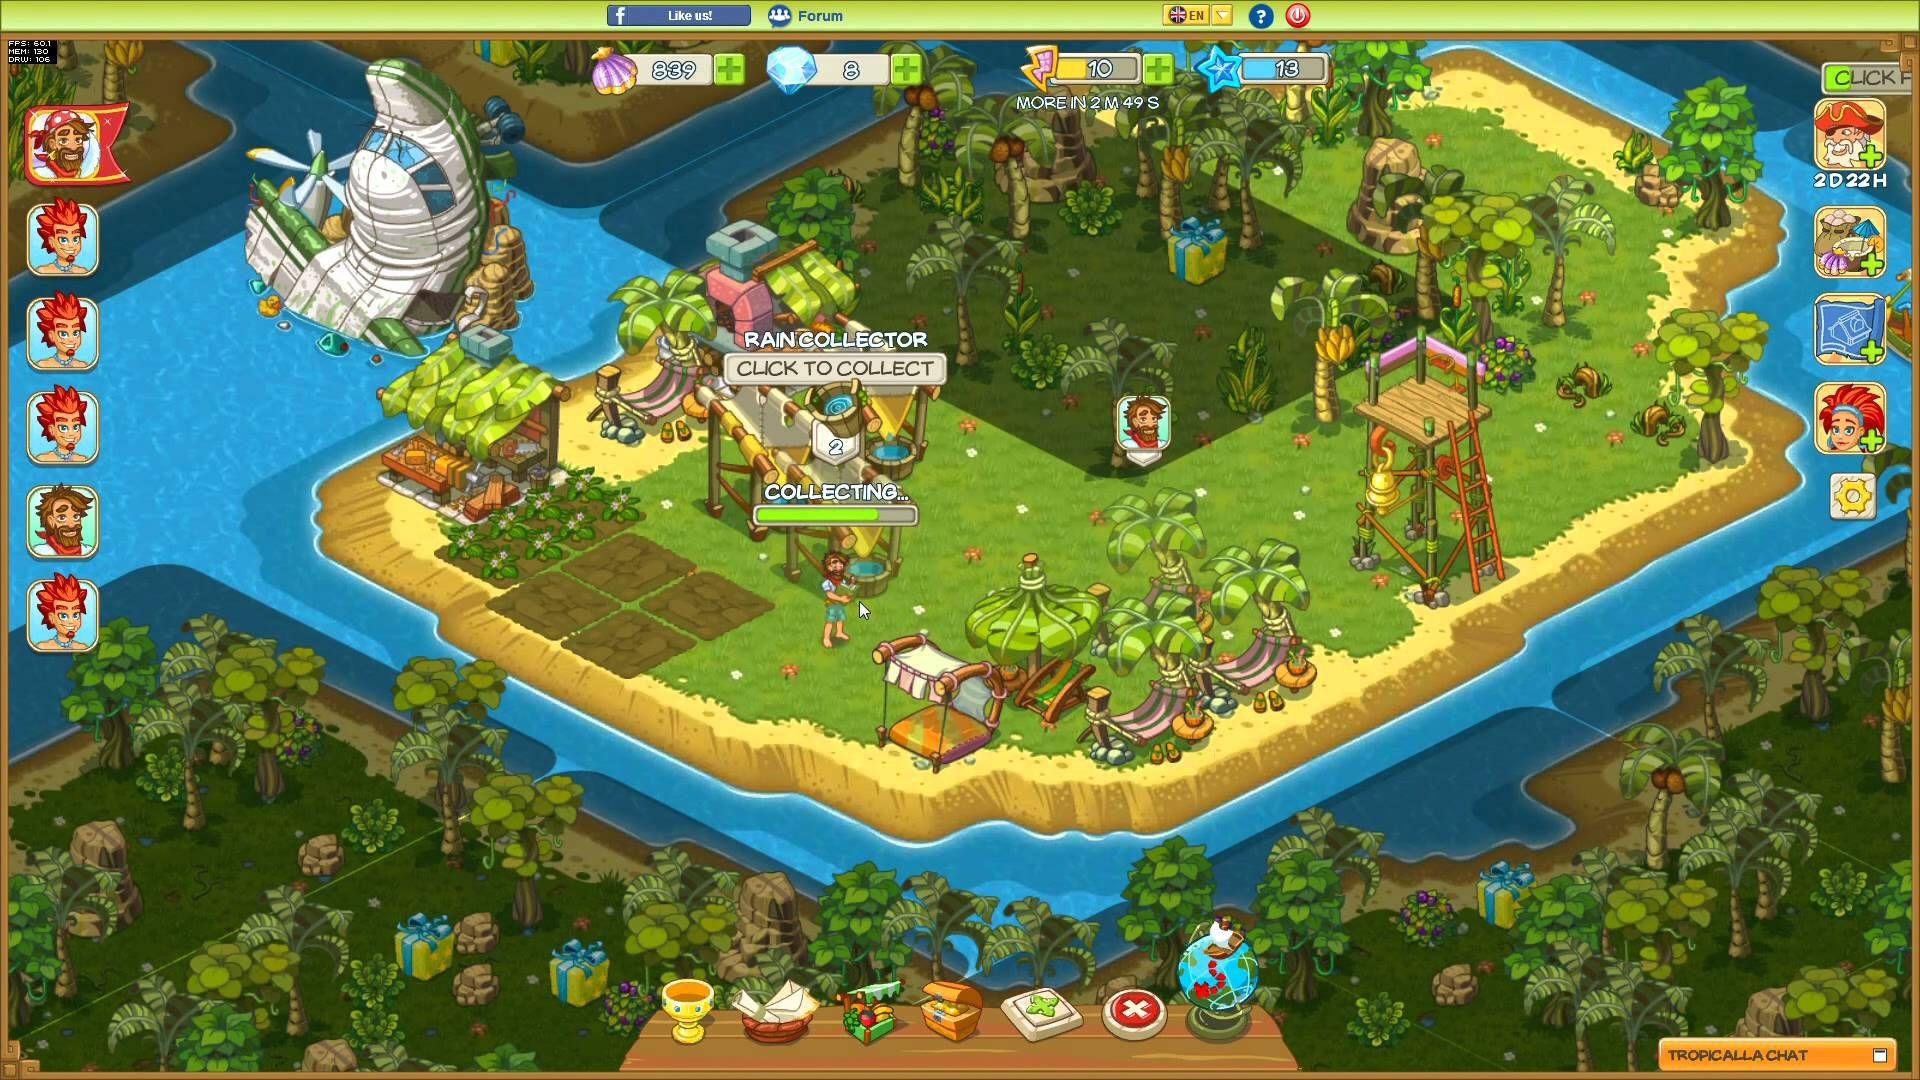 Tropicalla Raw Gameplay 4 Online Multiplayer Games Mmo Games Multiplayer Games